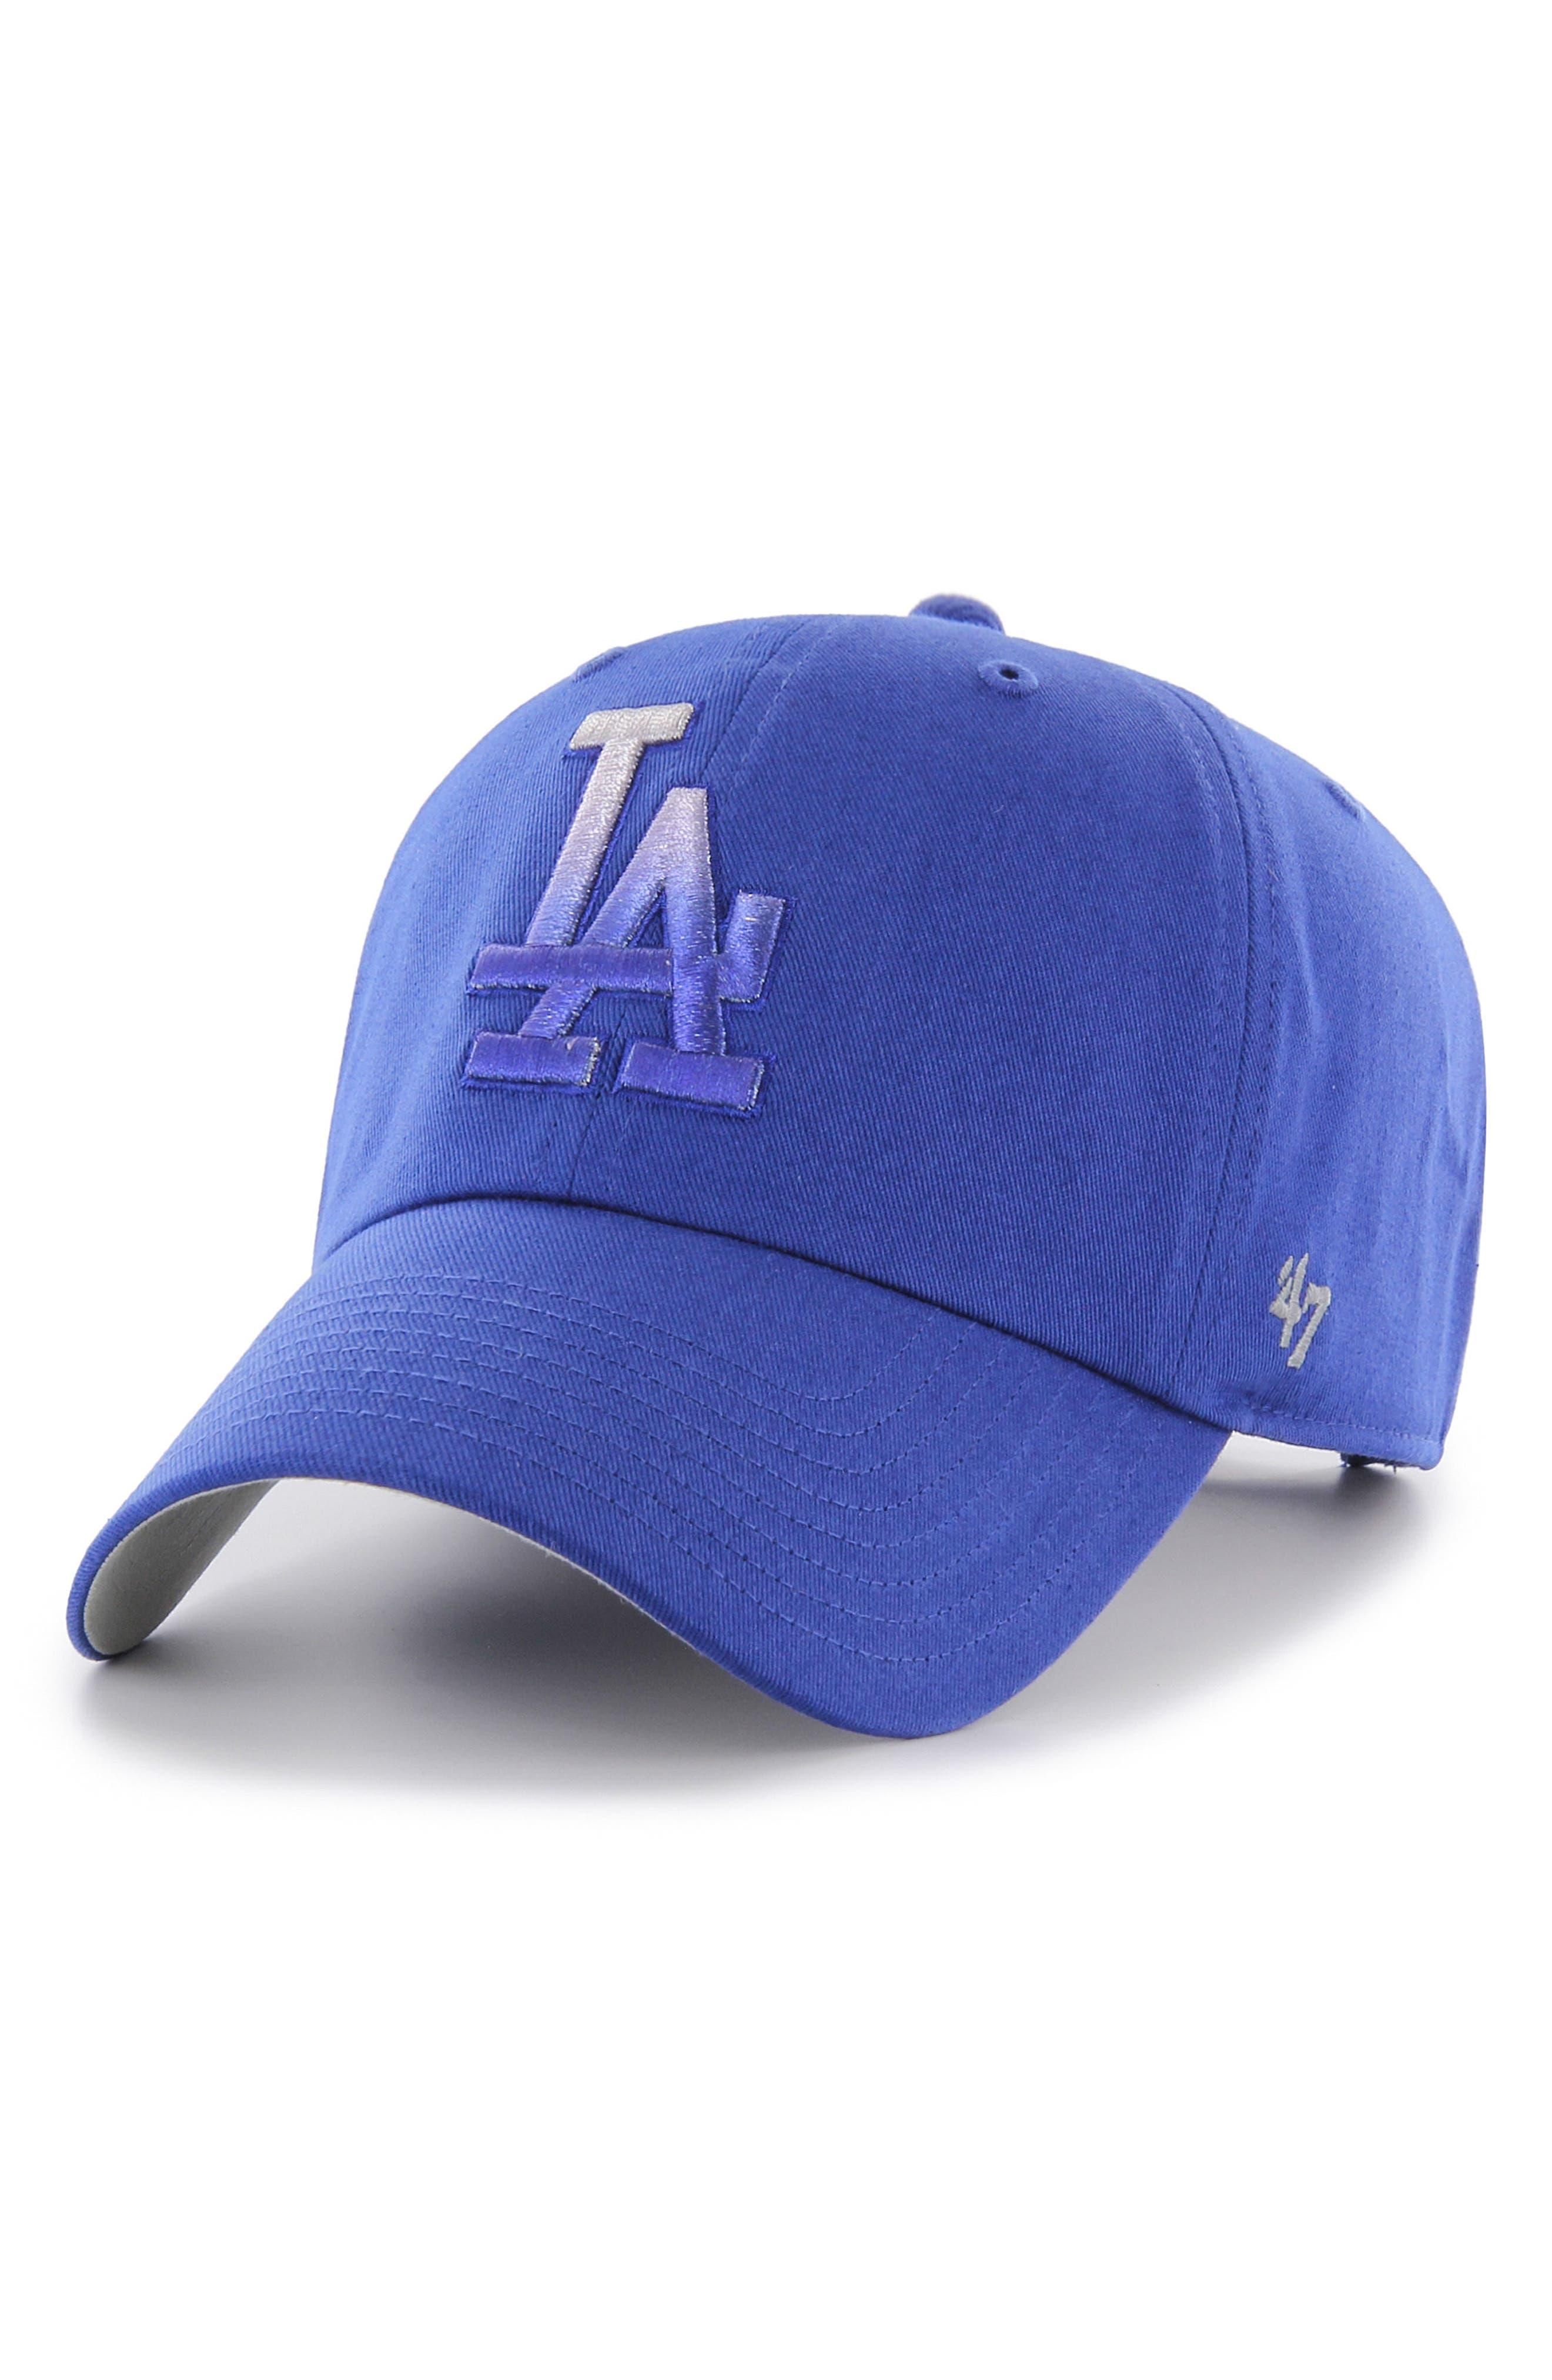 Falton MLB Logo Ball Cap,                             Main thumbnail 1, color,                             400